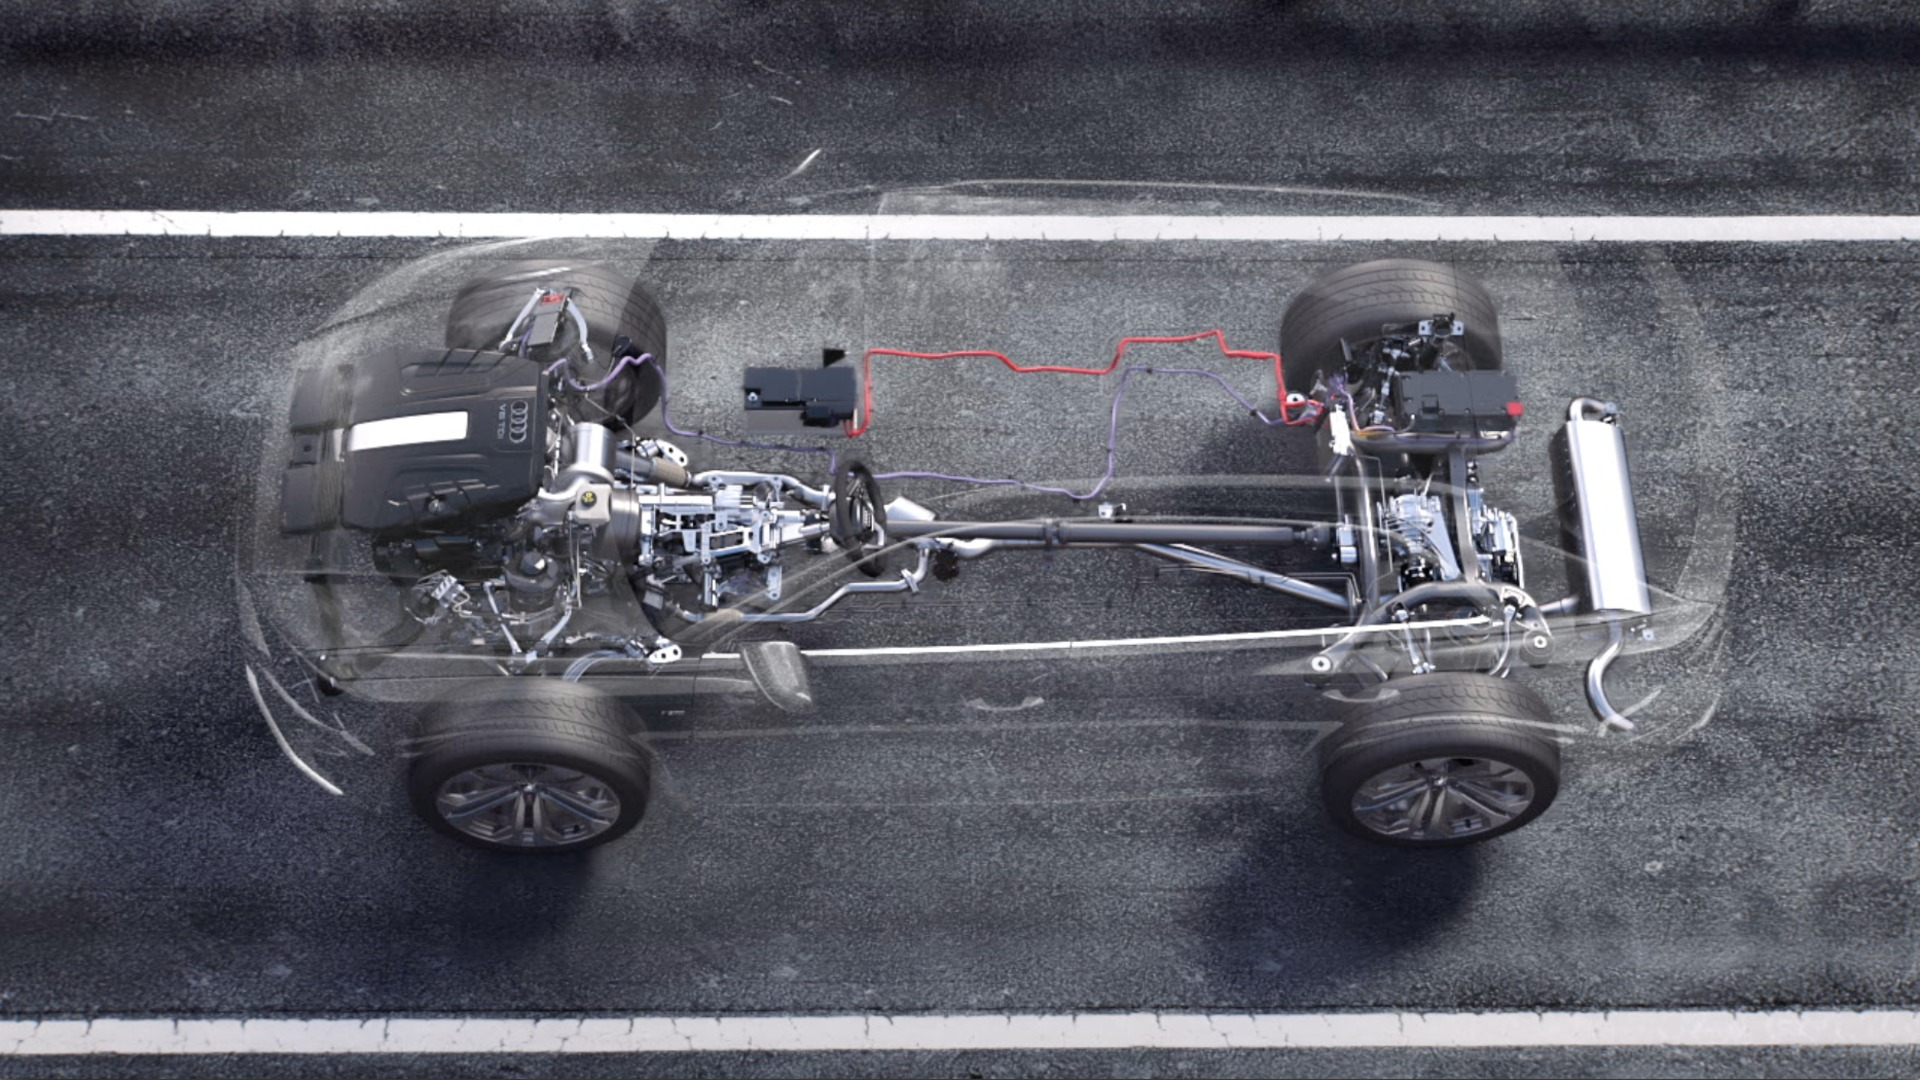 Animation Audi Q8 Mild-Hybrid-Technologie (MHEV)